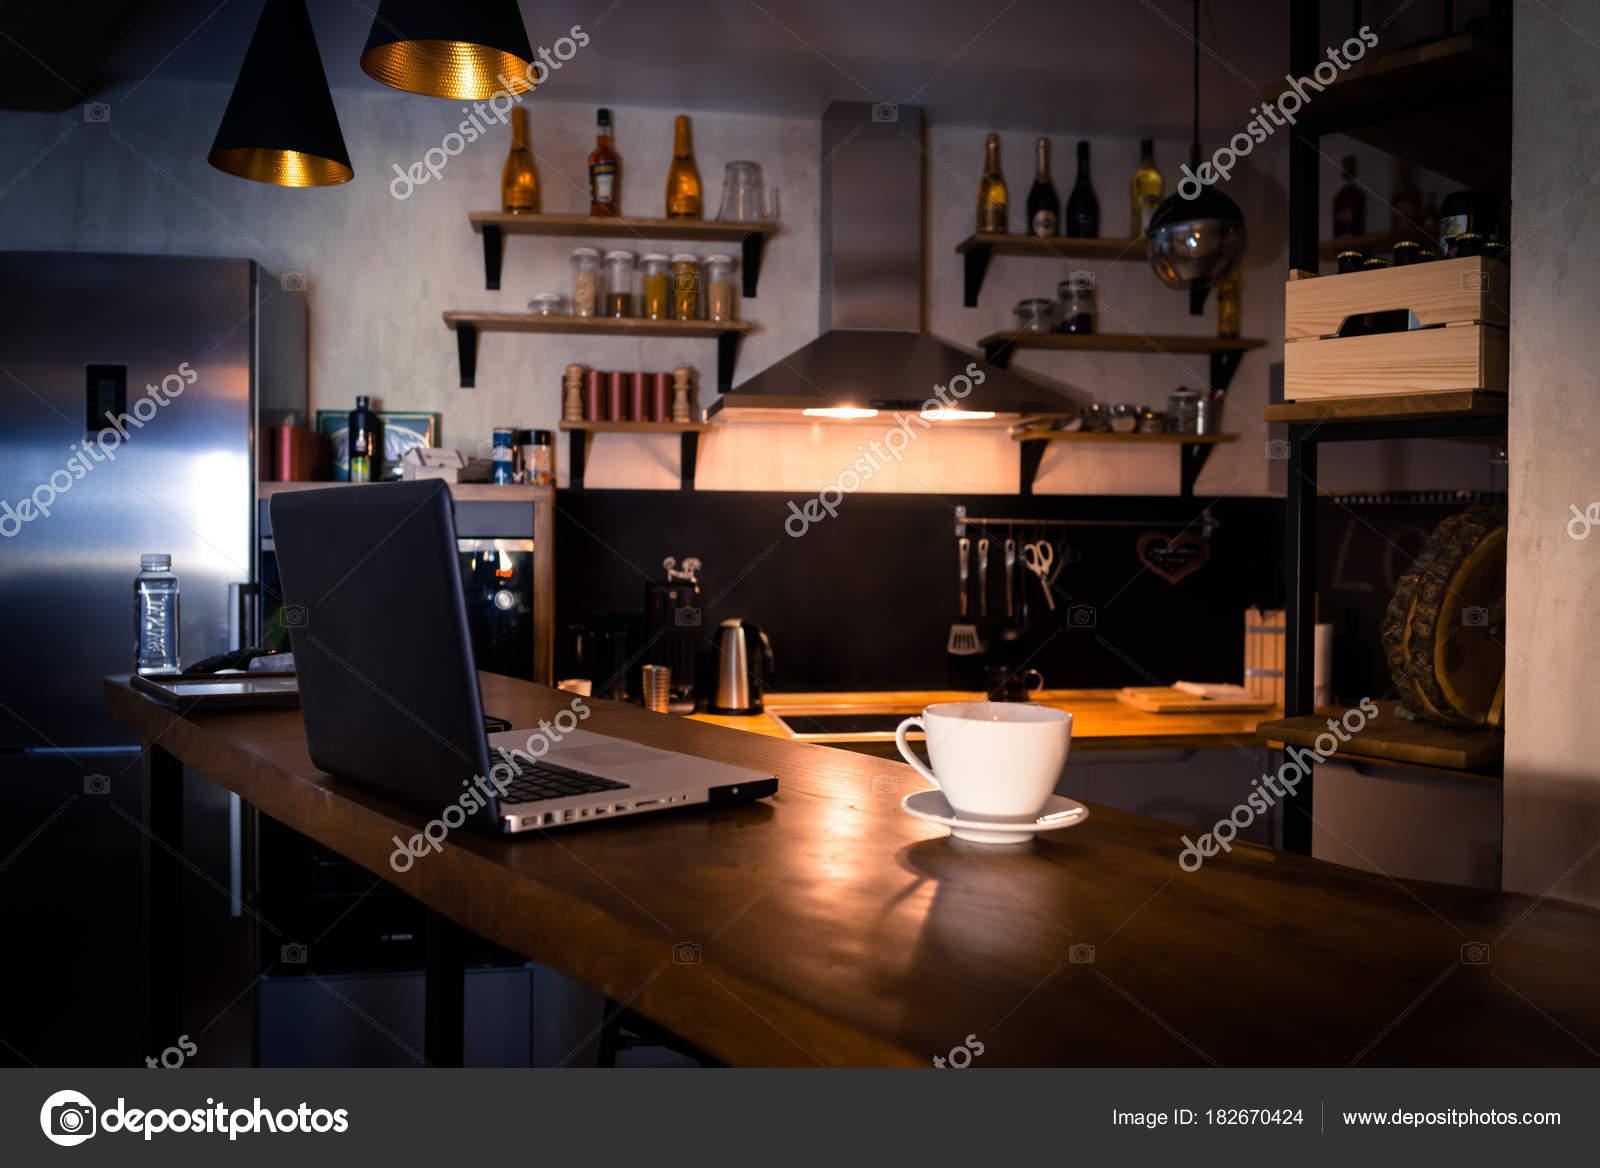 cucina con banco bar — Foto Stock © Sergey_T #182670424